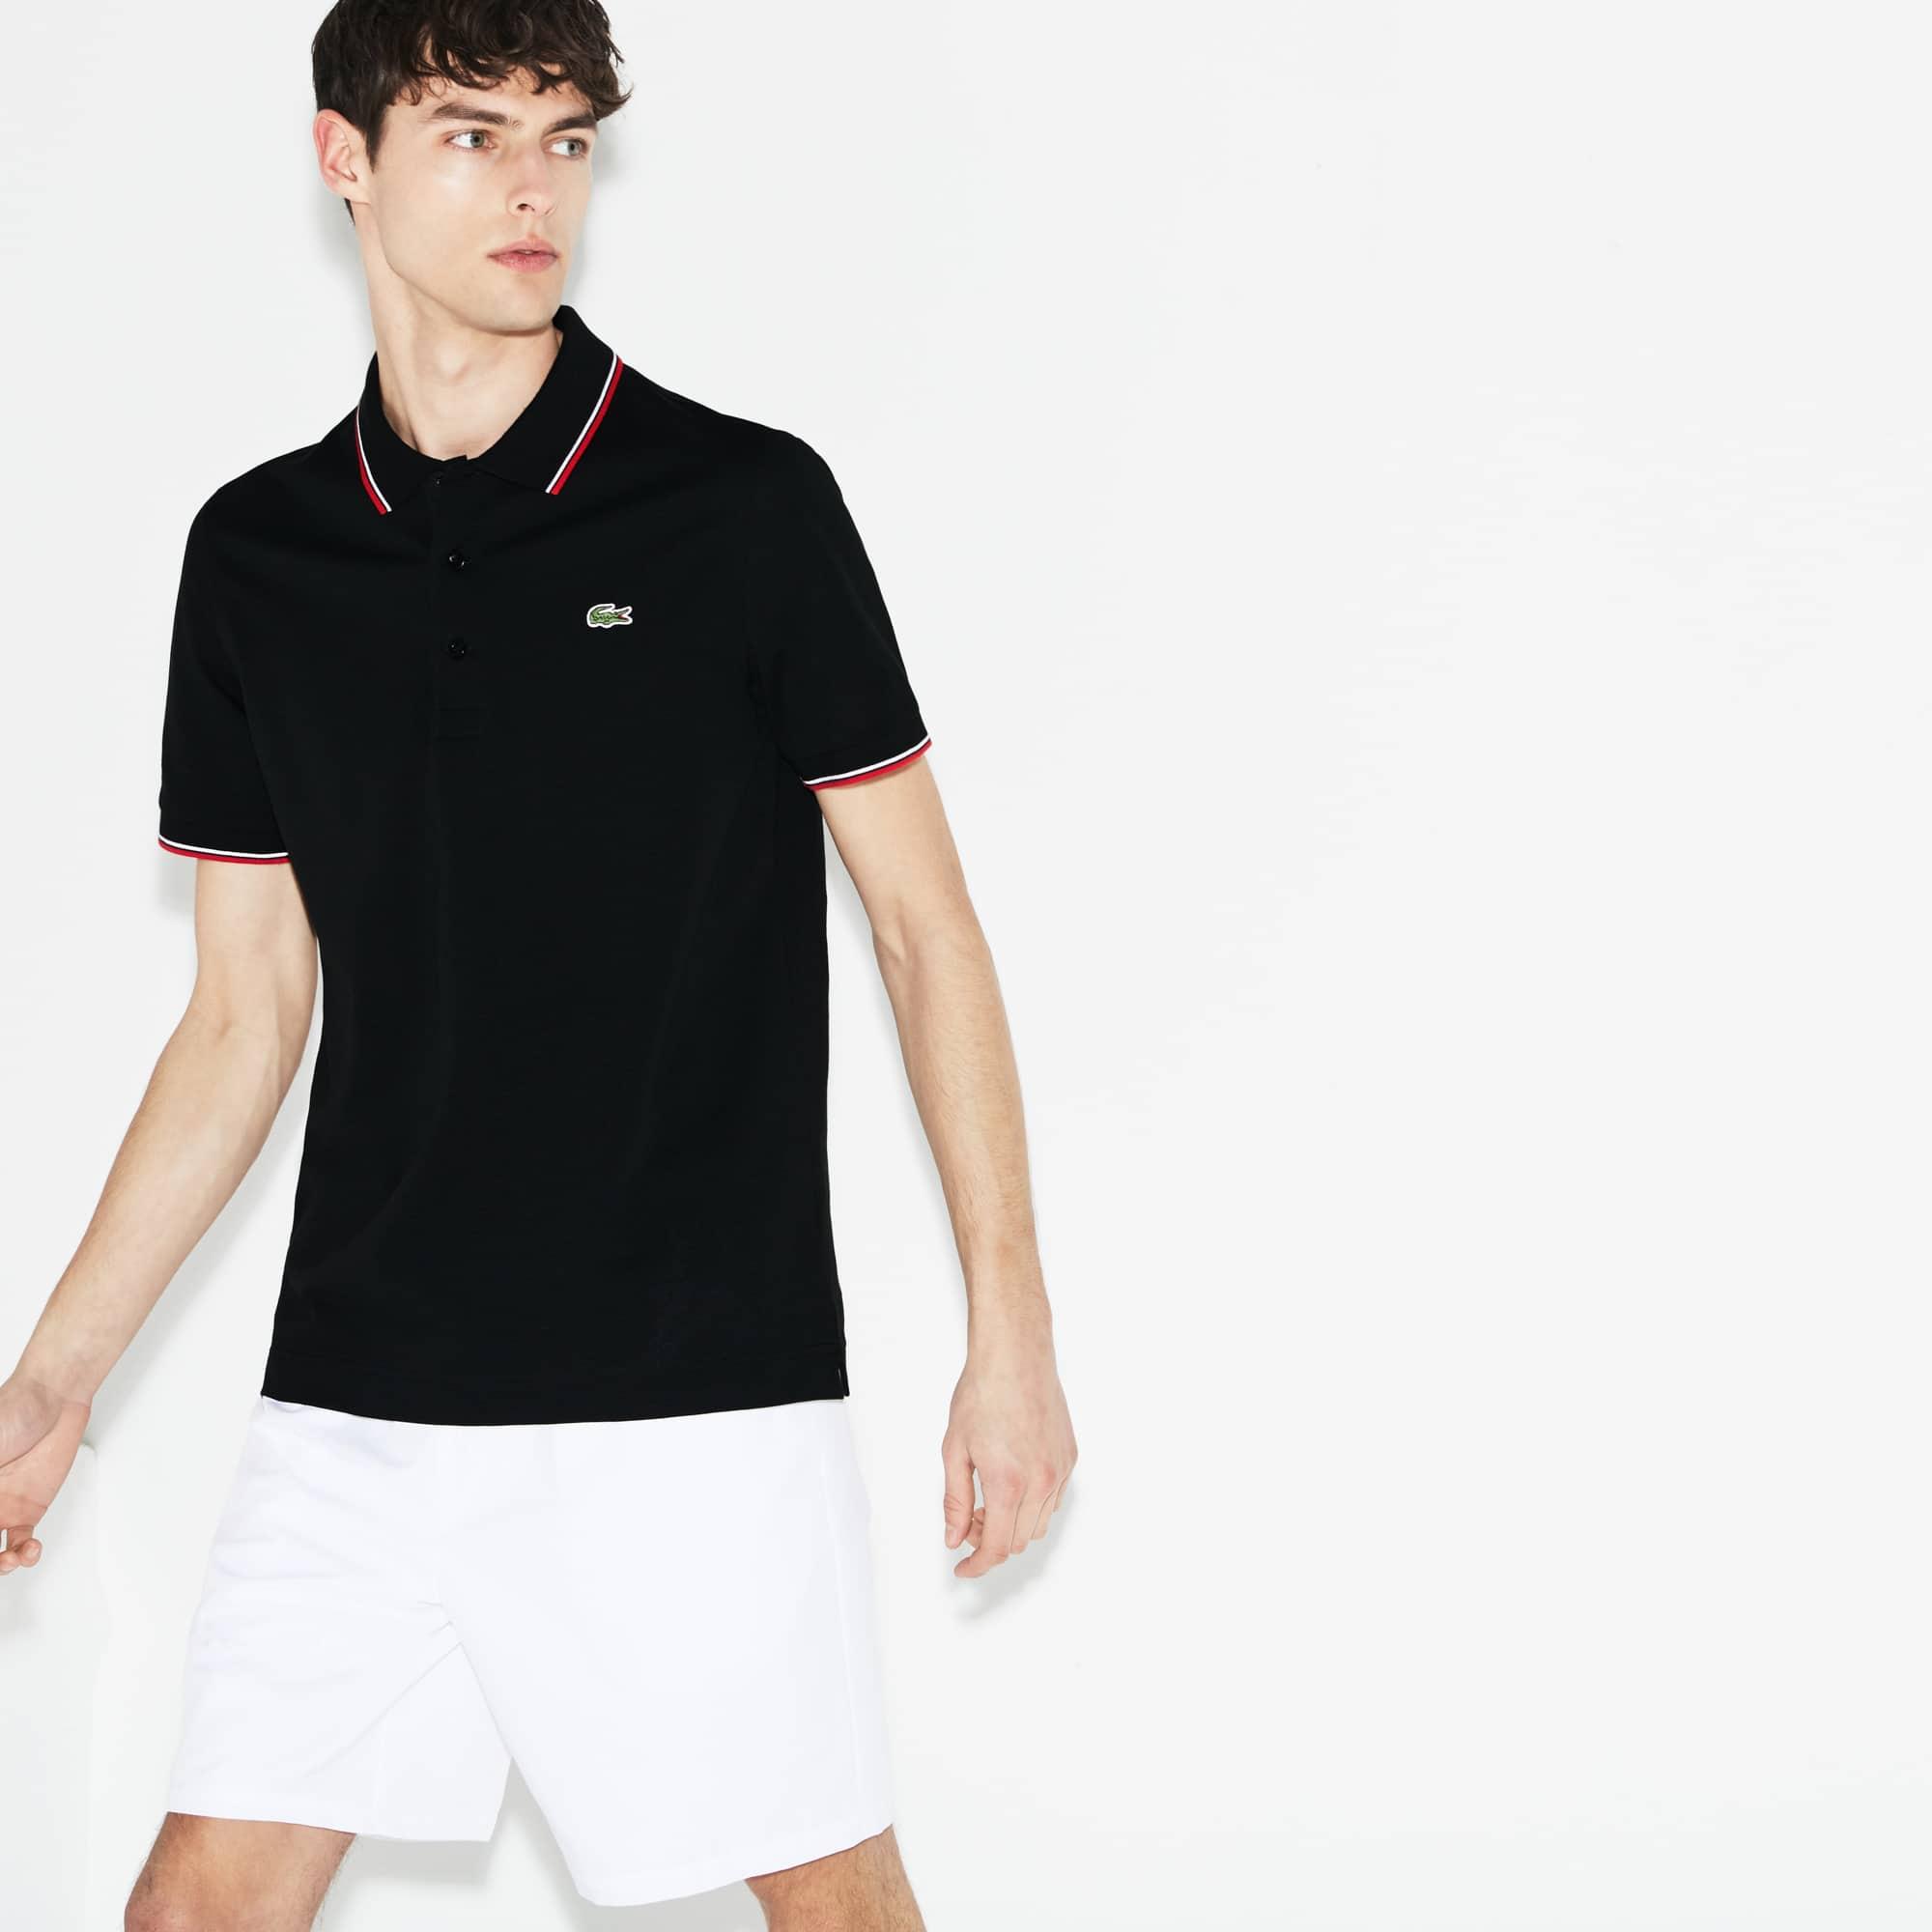 Men's SPORT Ultra-light Knits Polo